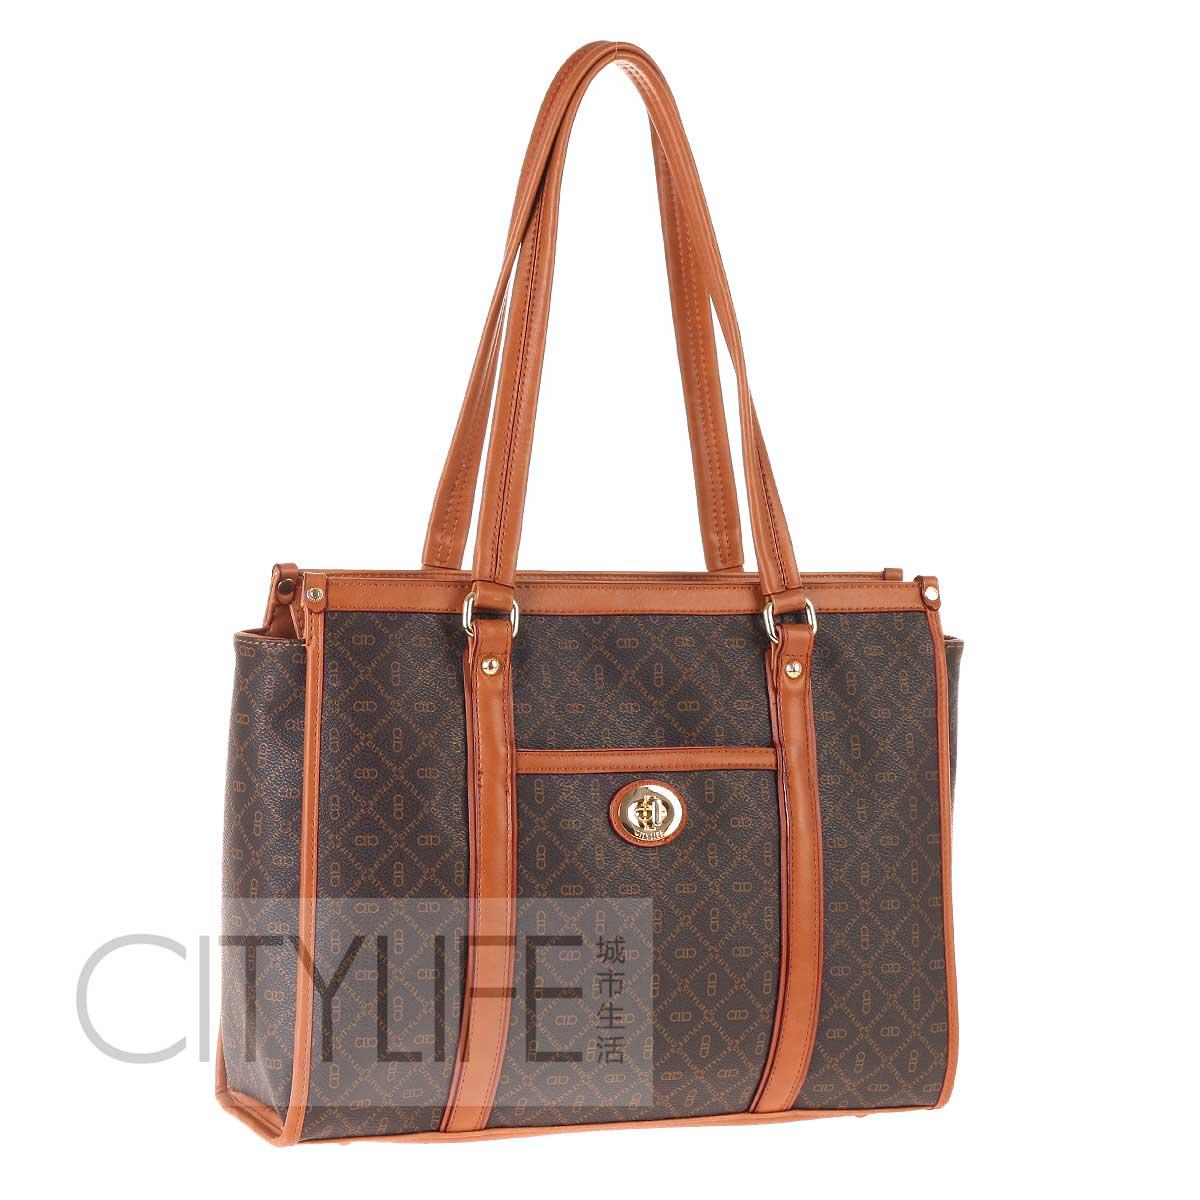 Winter 2012 citylife city life fashion women's print fashion handbag work bag star bag(China (Mainland))